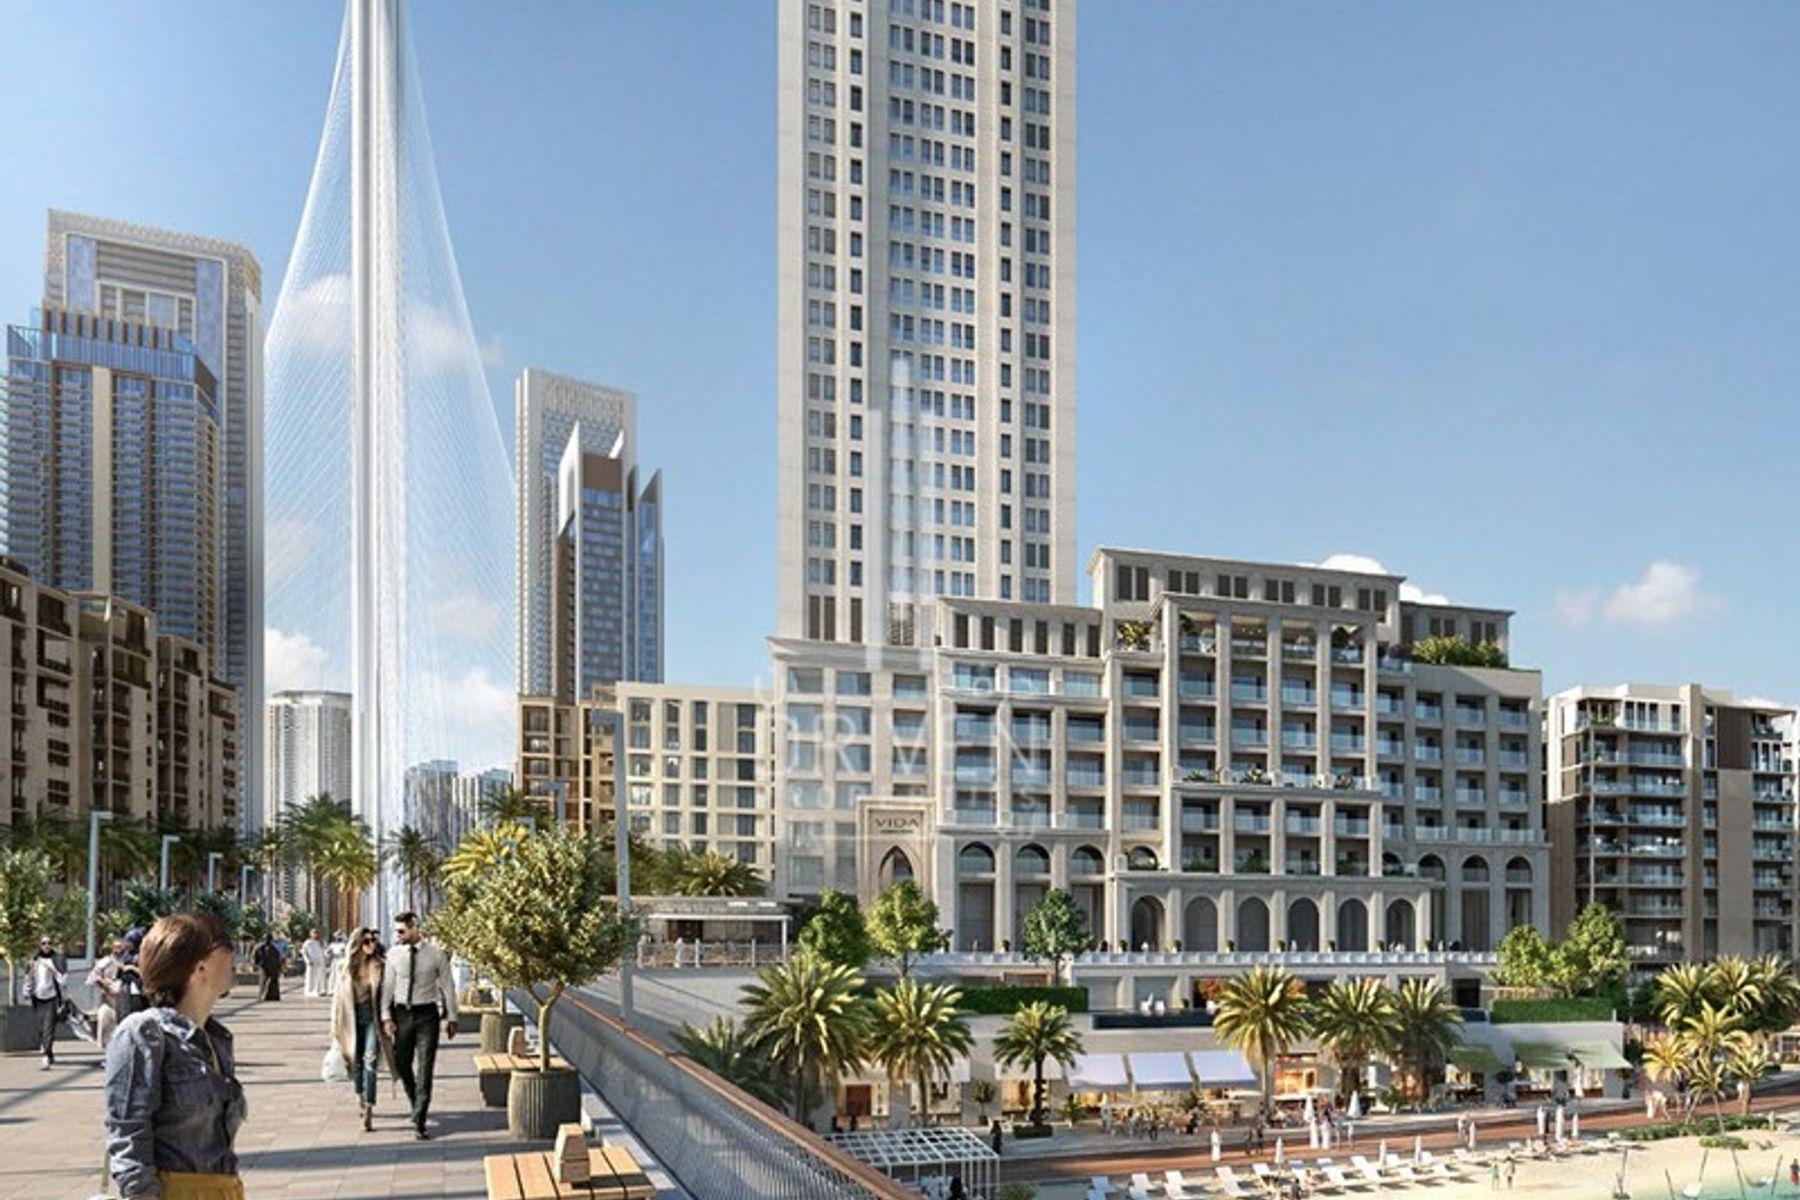 Apartment for Sale in Surf - Dubai Creek Harbour